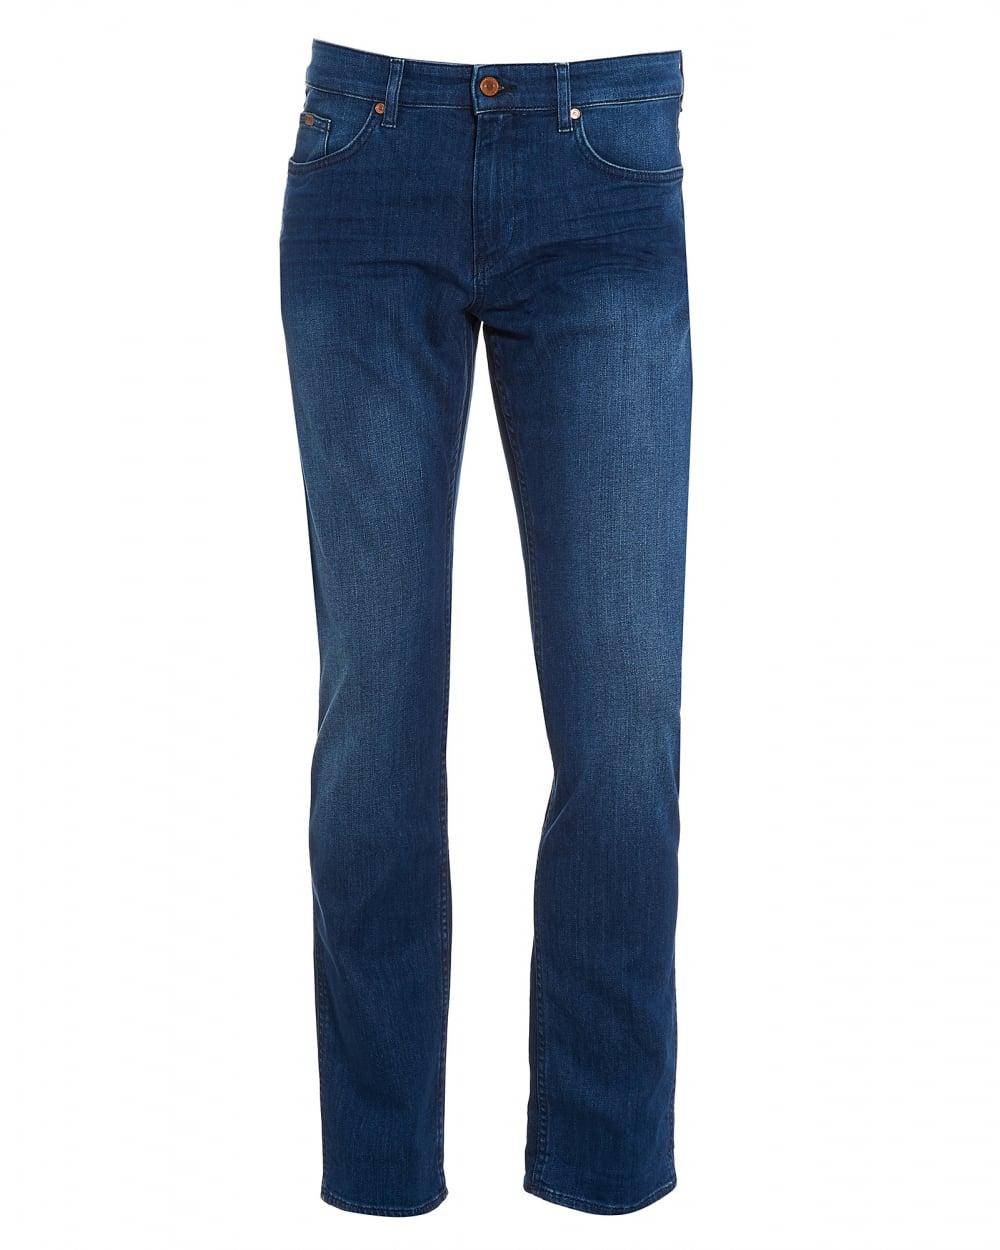 edb5571089d Hugo Boss Green Mens C-Delaware1 Stretch Slim Fit Mid Light Jeans